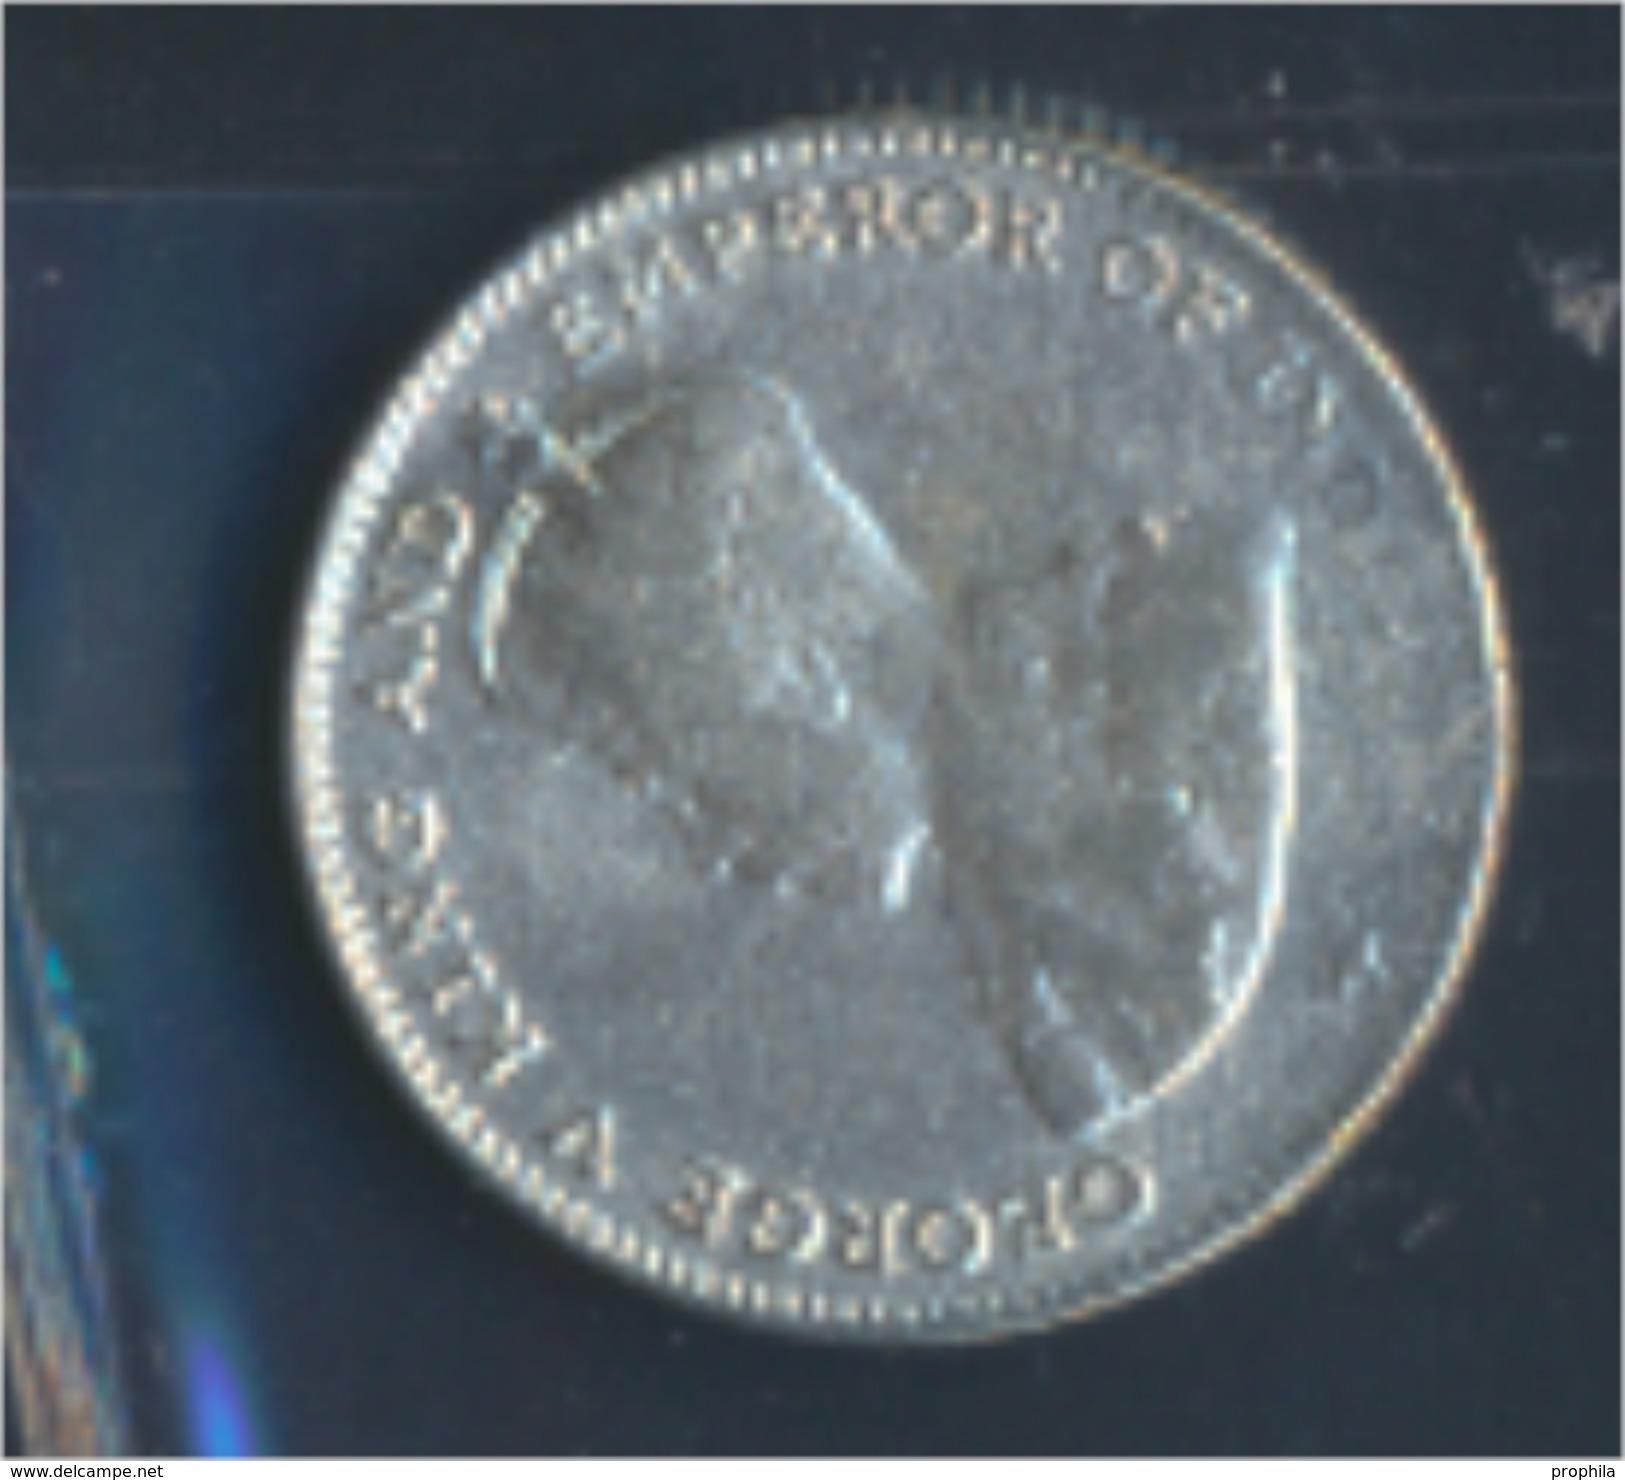 Straits Settlements KM-Nr. : 29 1918 Sehr Schön Silber 1918 10 Cents George V. (8977151 - Malaysie